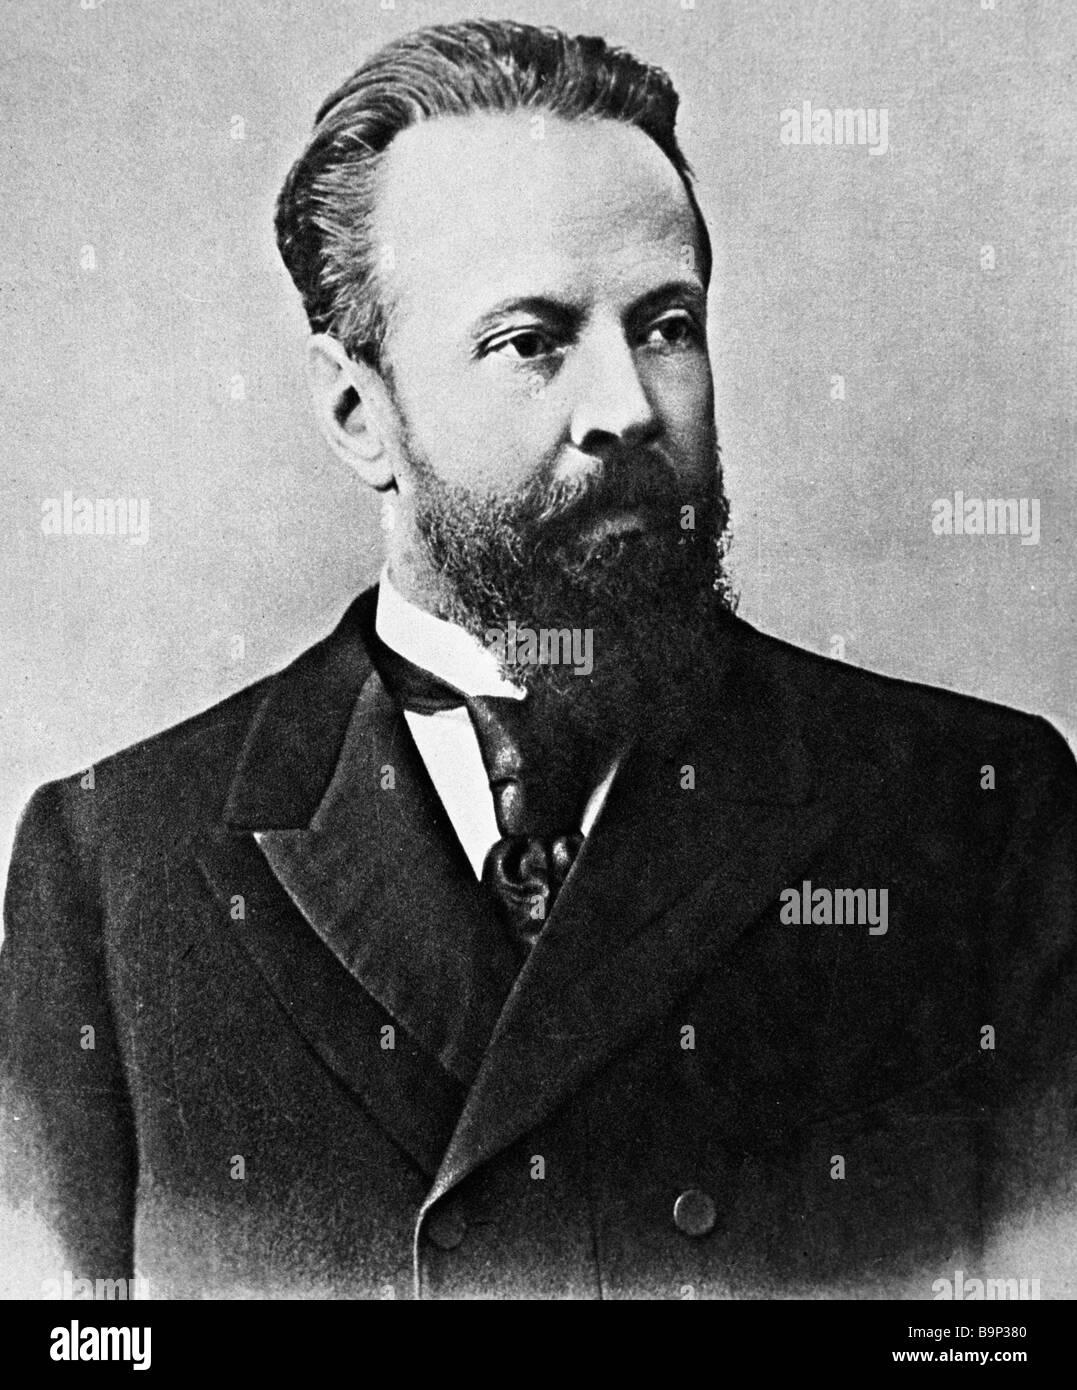 Russian statesman Sergei Witte - Stock Image